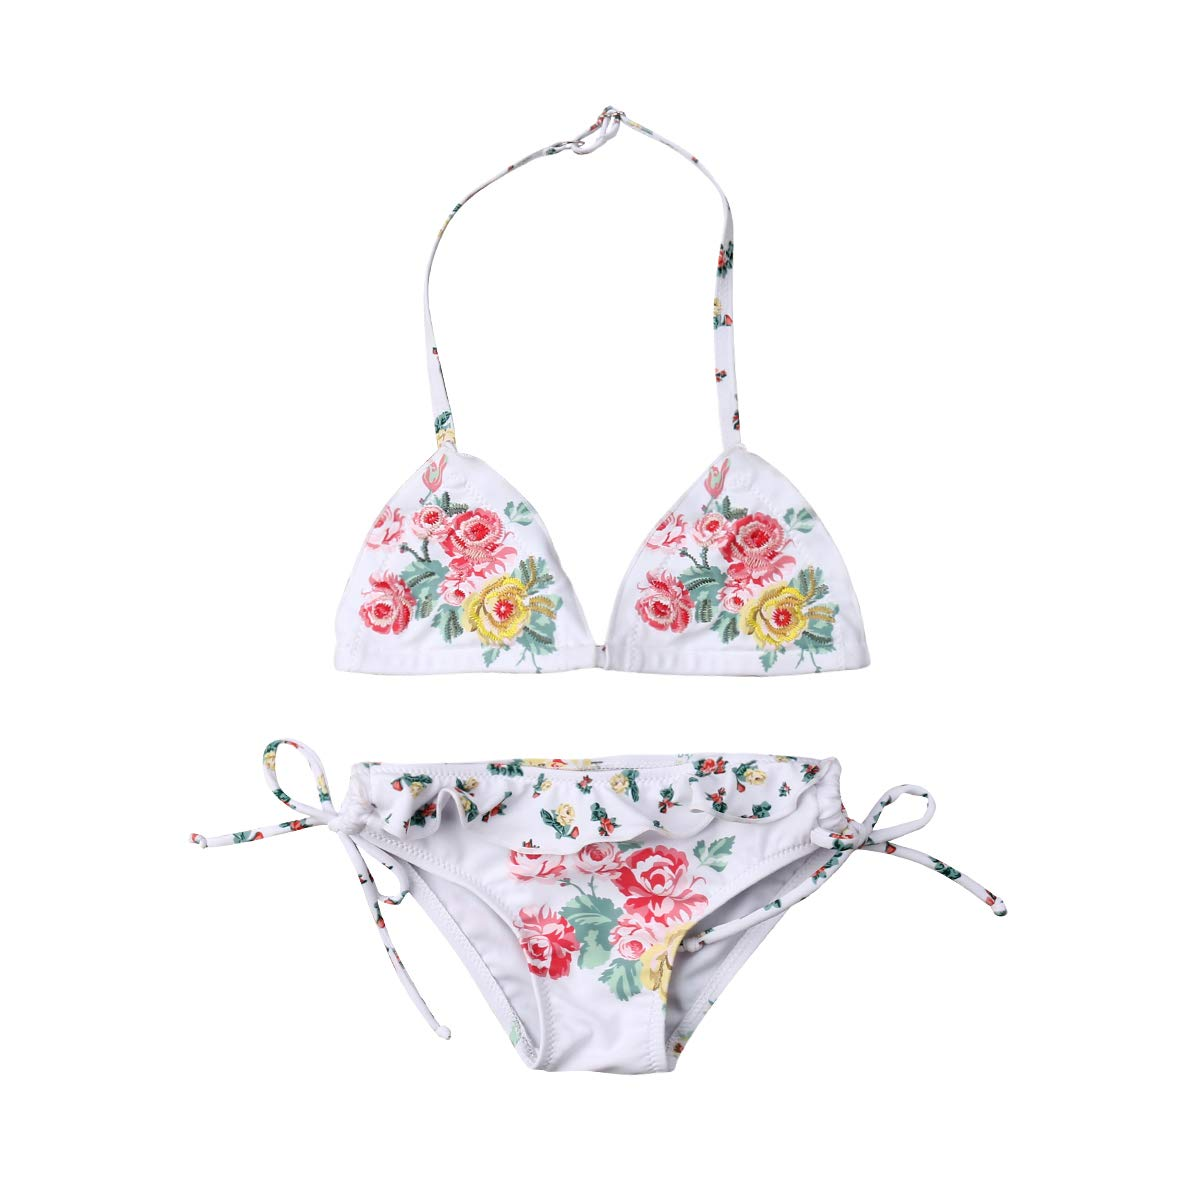 Douhoow Toddler Kids Girls 2-Pieces Swimsuit Bottom Beach Wear Swimwear Set Floral Halter Bikini Tops